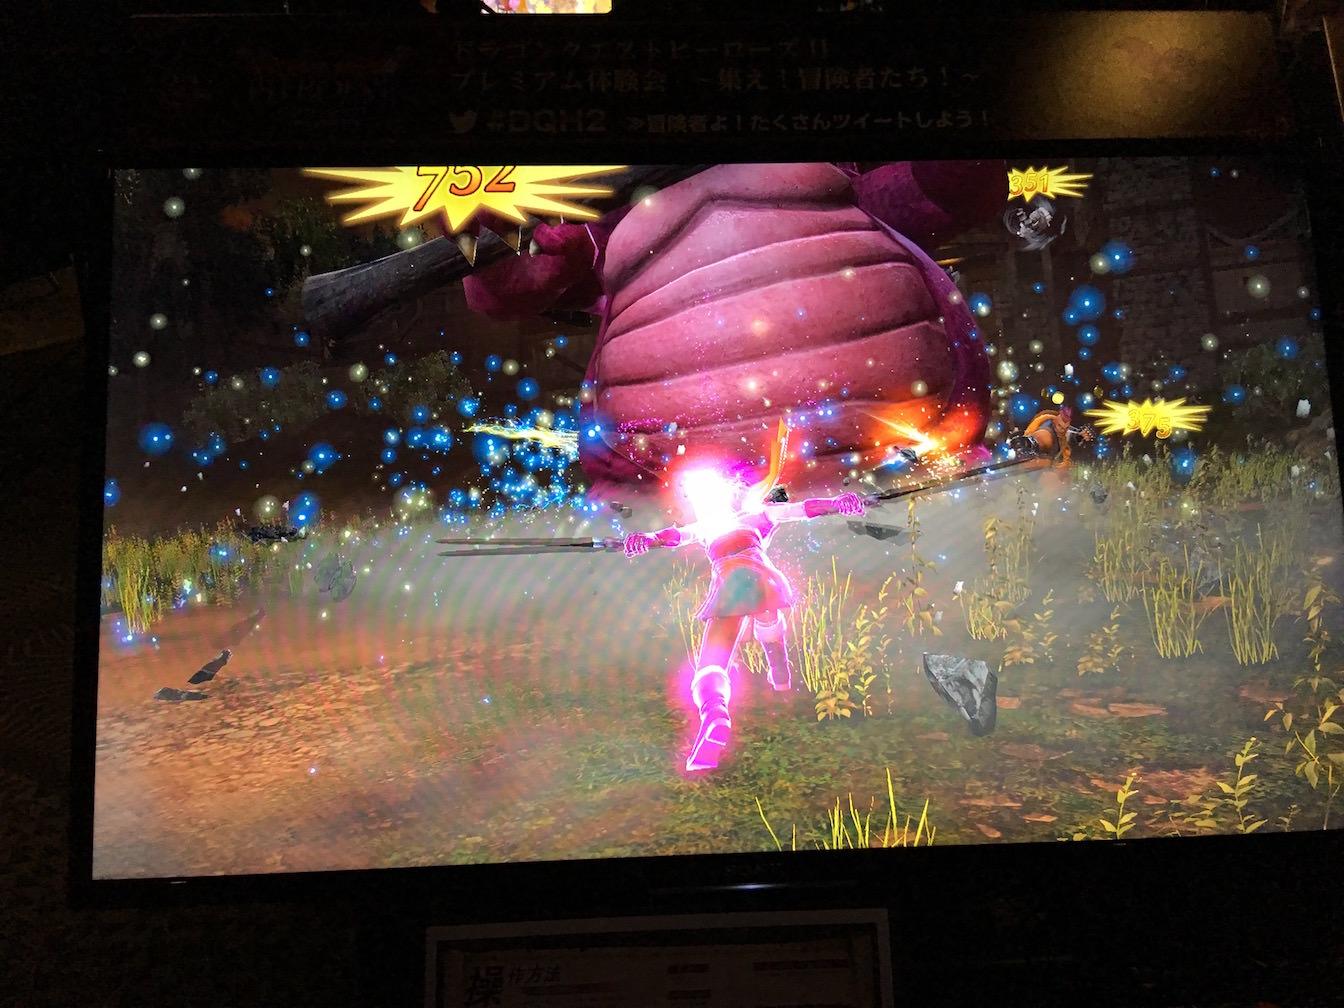 Dragon quest heros 2 premium experience meeting report 26